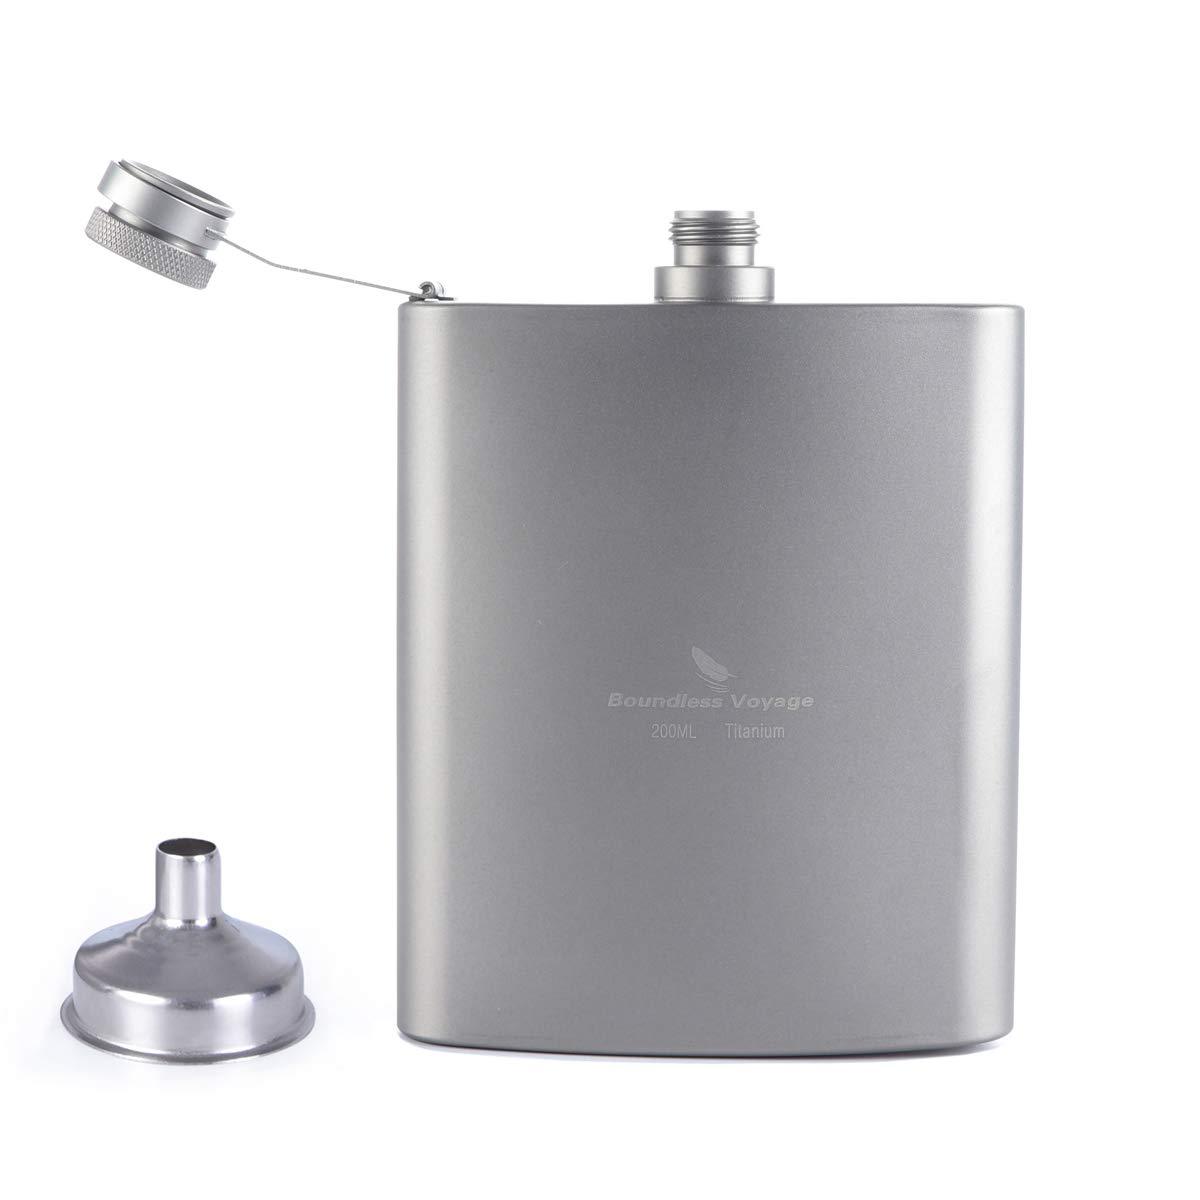 Zxmy Titanium Pocket Hip Flask 7 oz Flagon Camping Portable Alcohol Drink Bottle